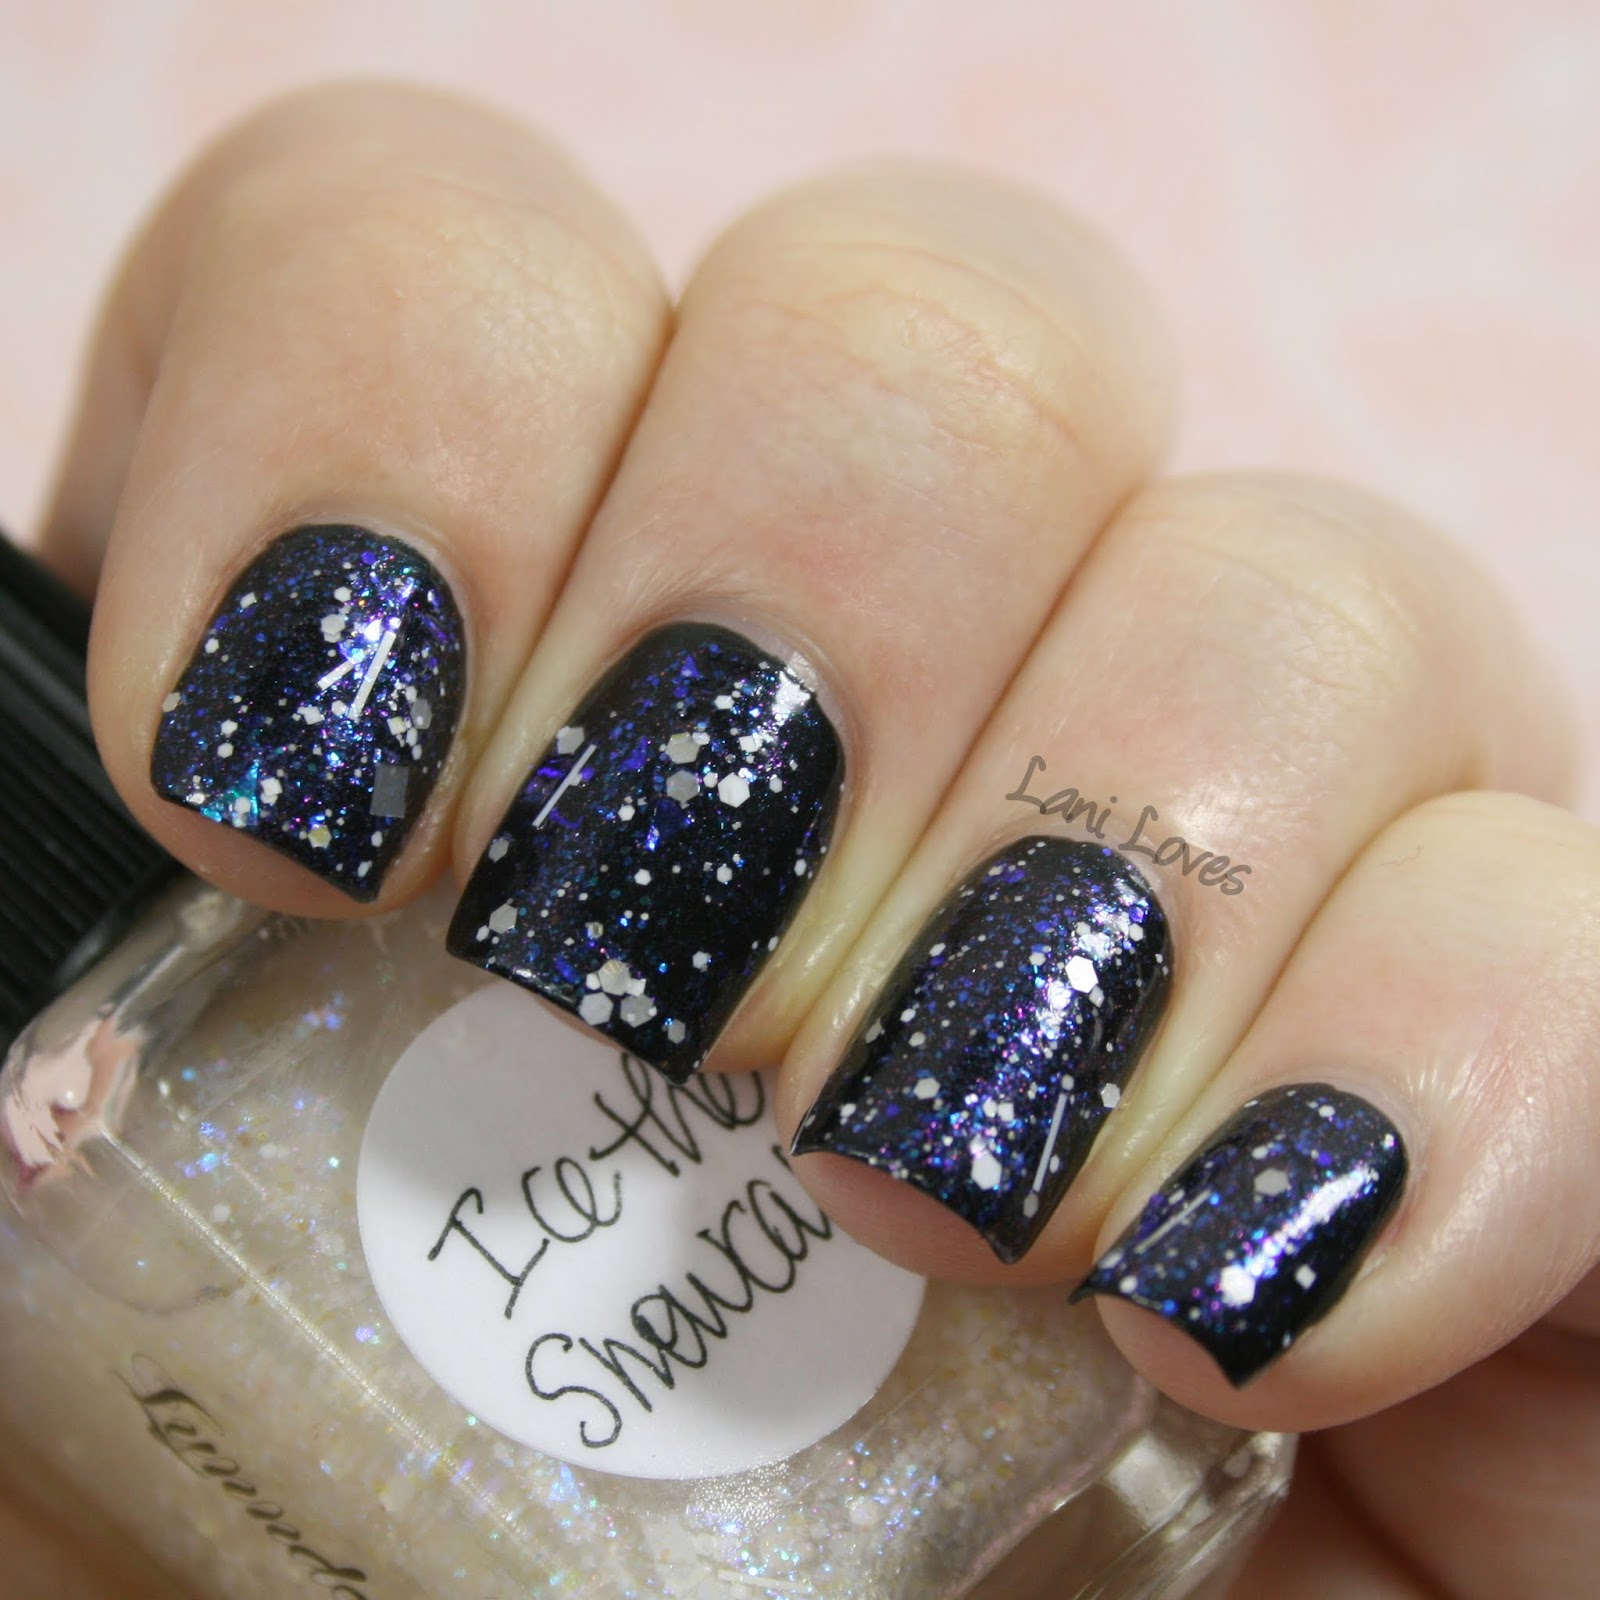 Lynnderella Ice the Snowcake nail polish swatch